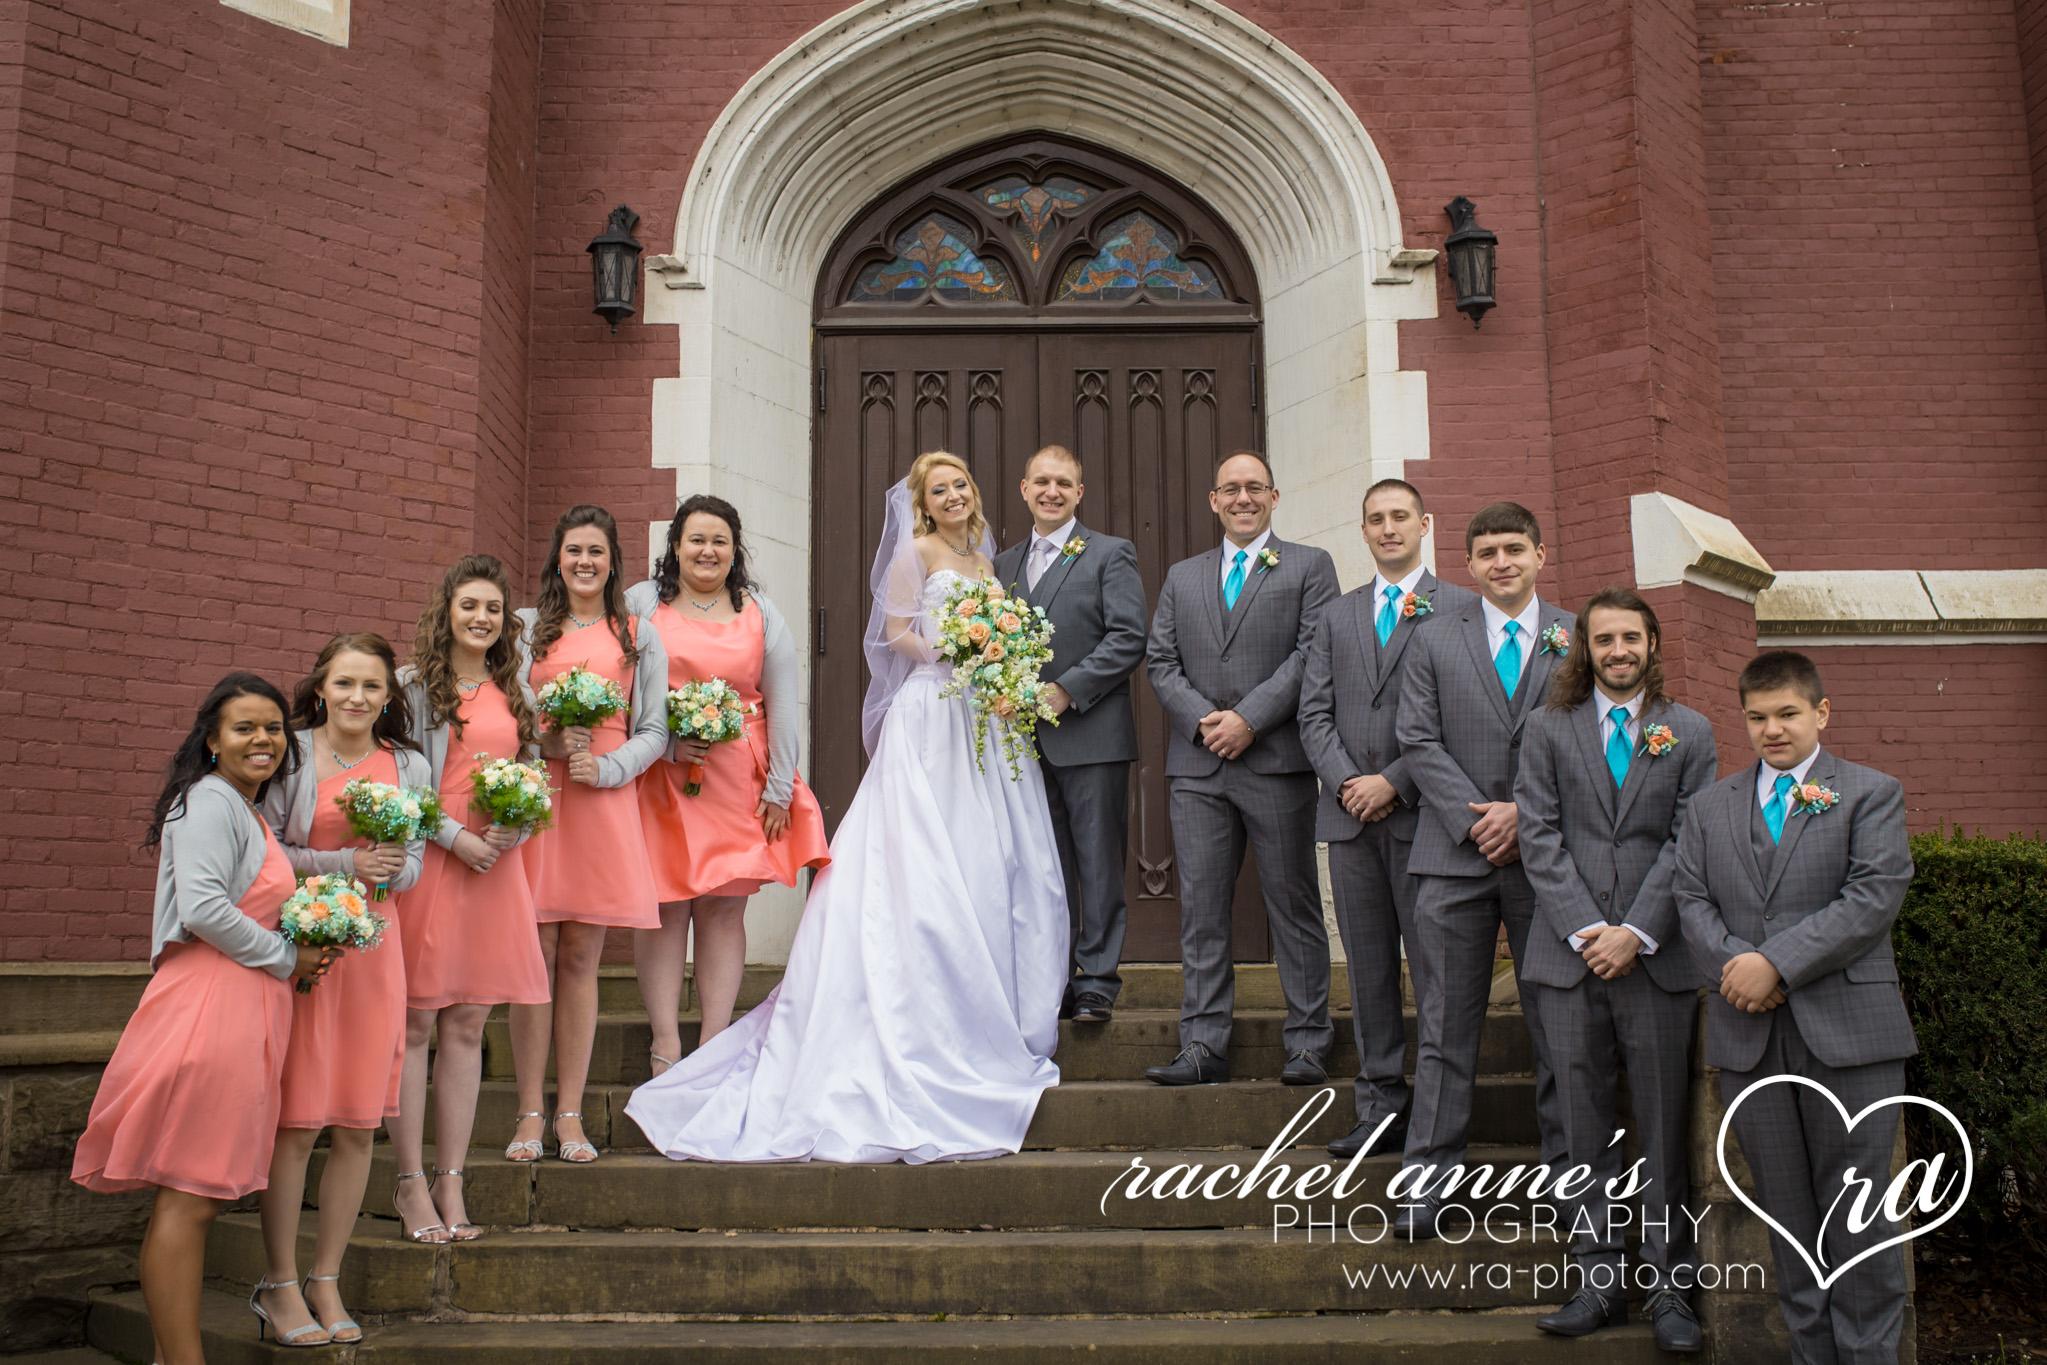 033-JKS-WEDDINGS-THE-FRANKLIN-PA.jpg